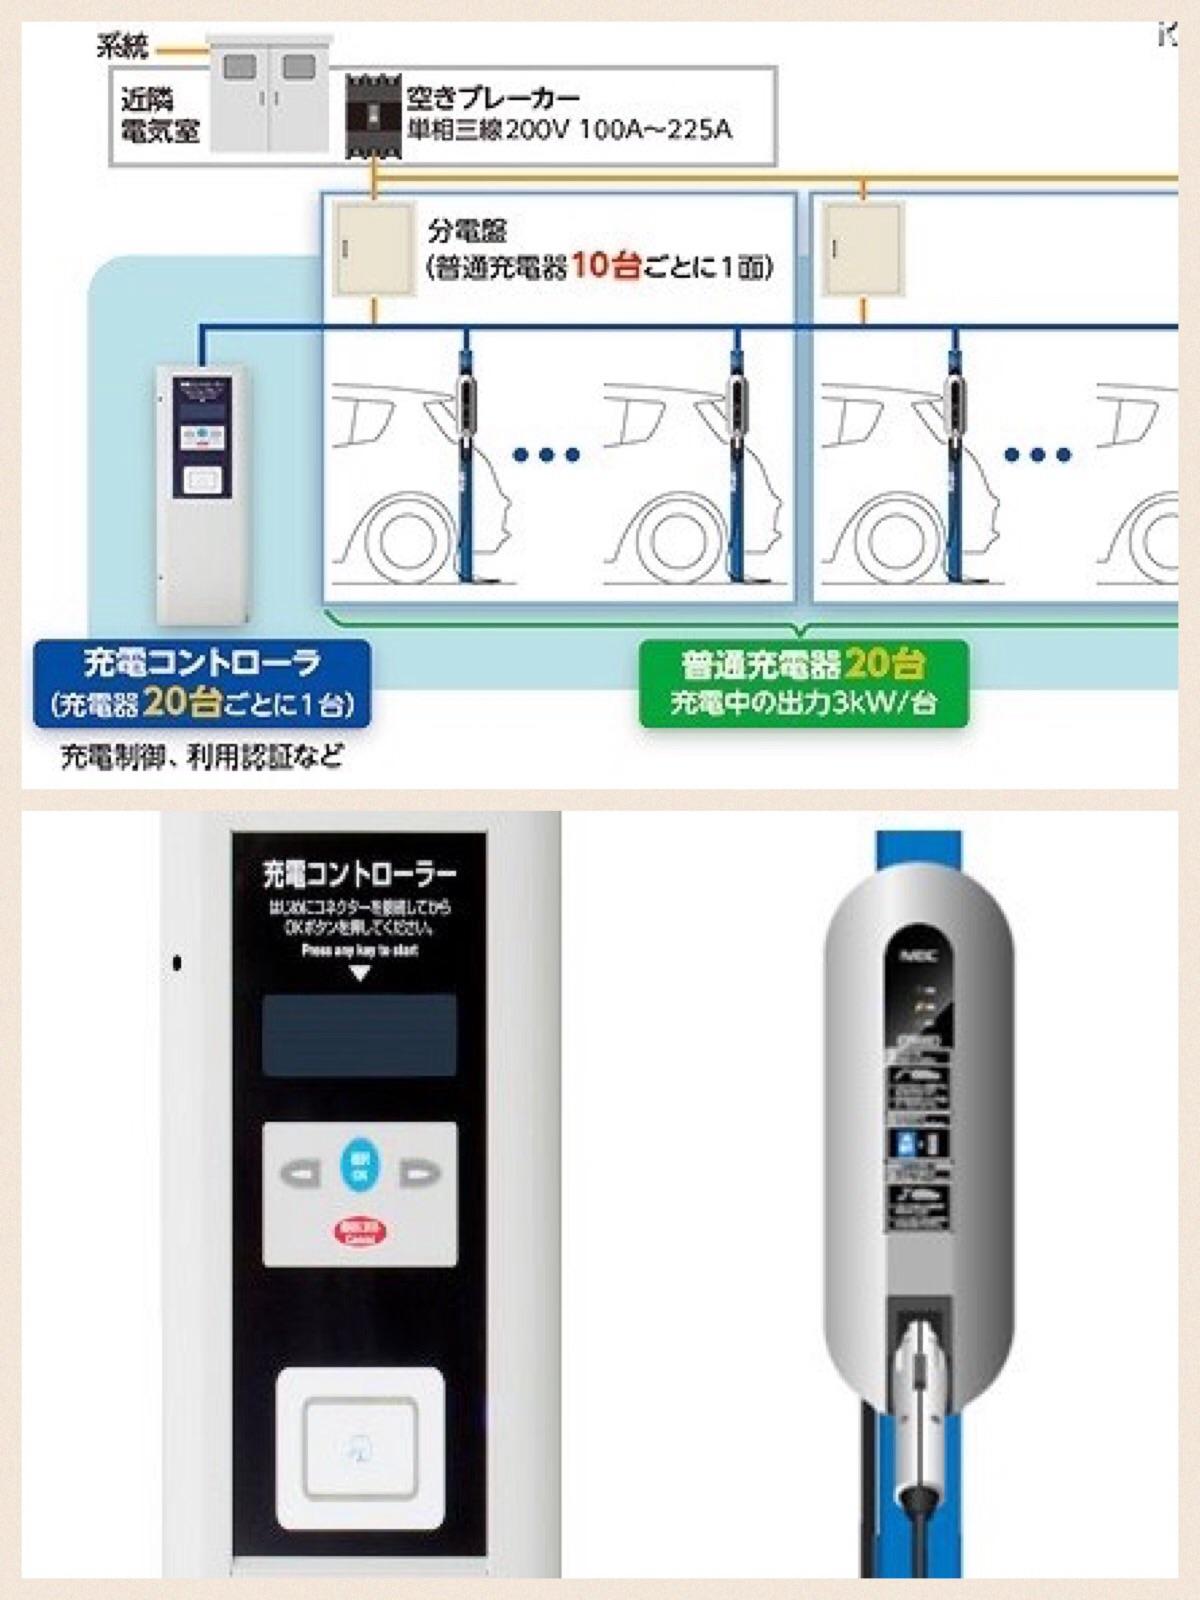 NEC EV充電器システム 東京ミッドタウン